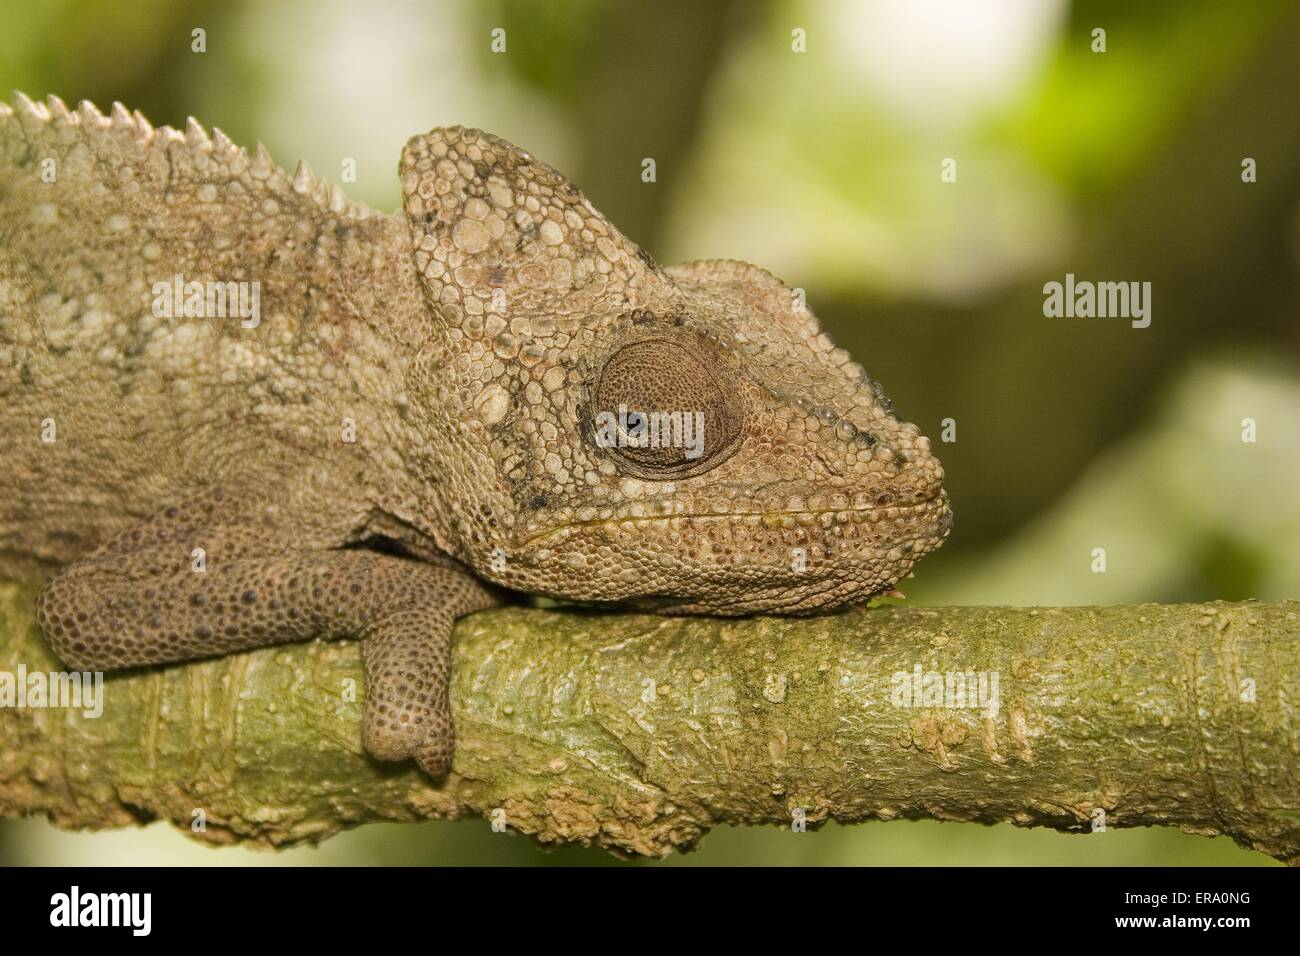 Warty Chameleon - Stock Image